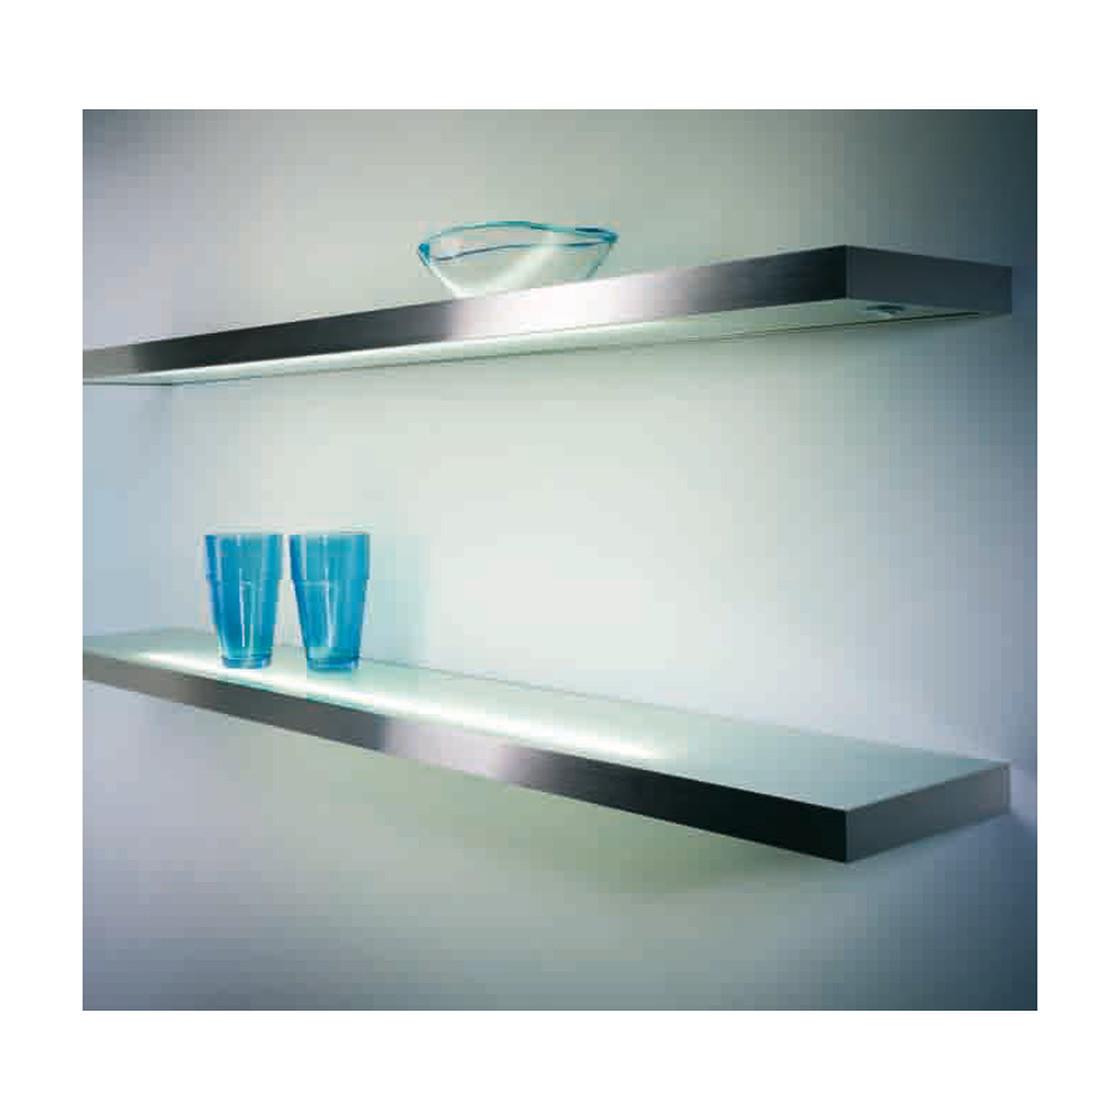 Lista 30 LED, Lichtboden, L 600 mm, 5,3 W, edelstahlfarbig